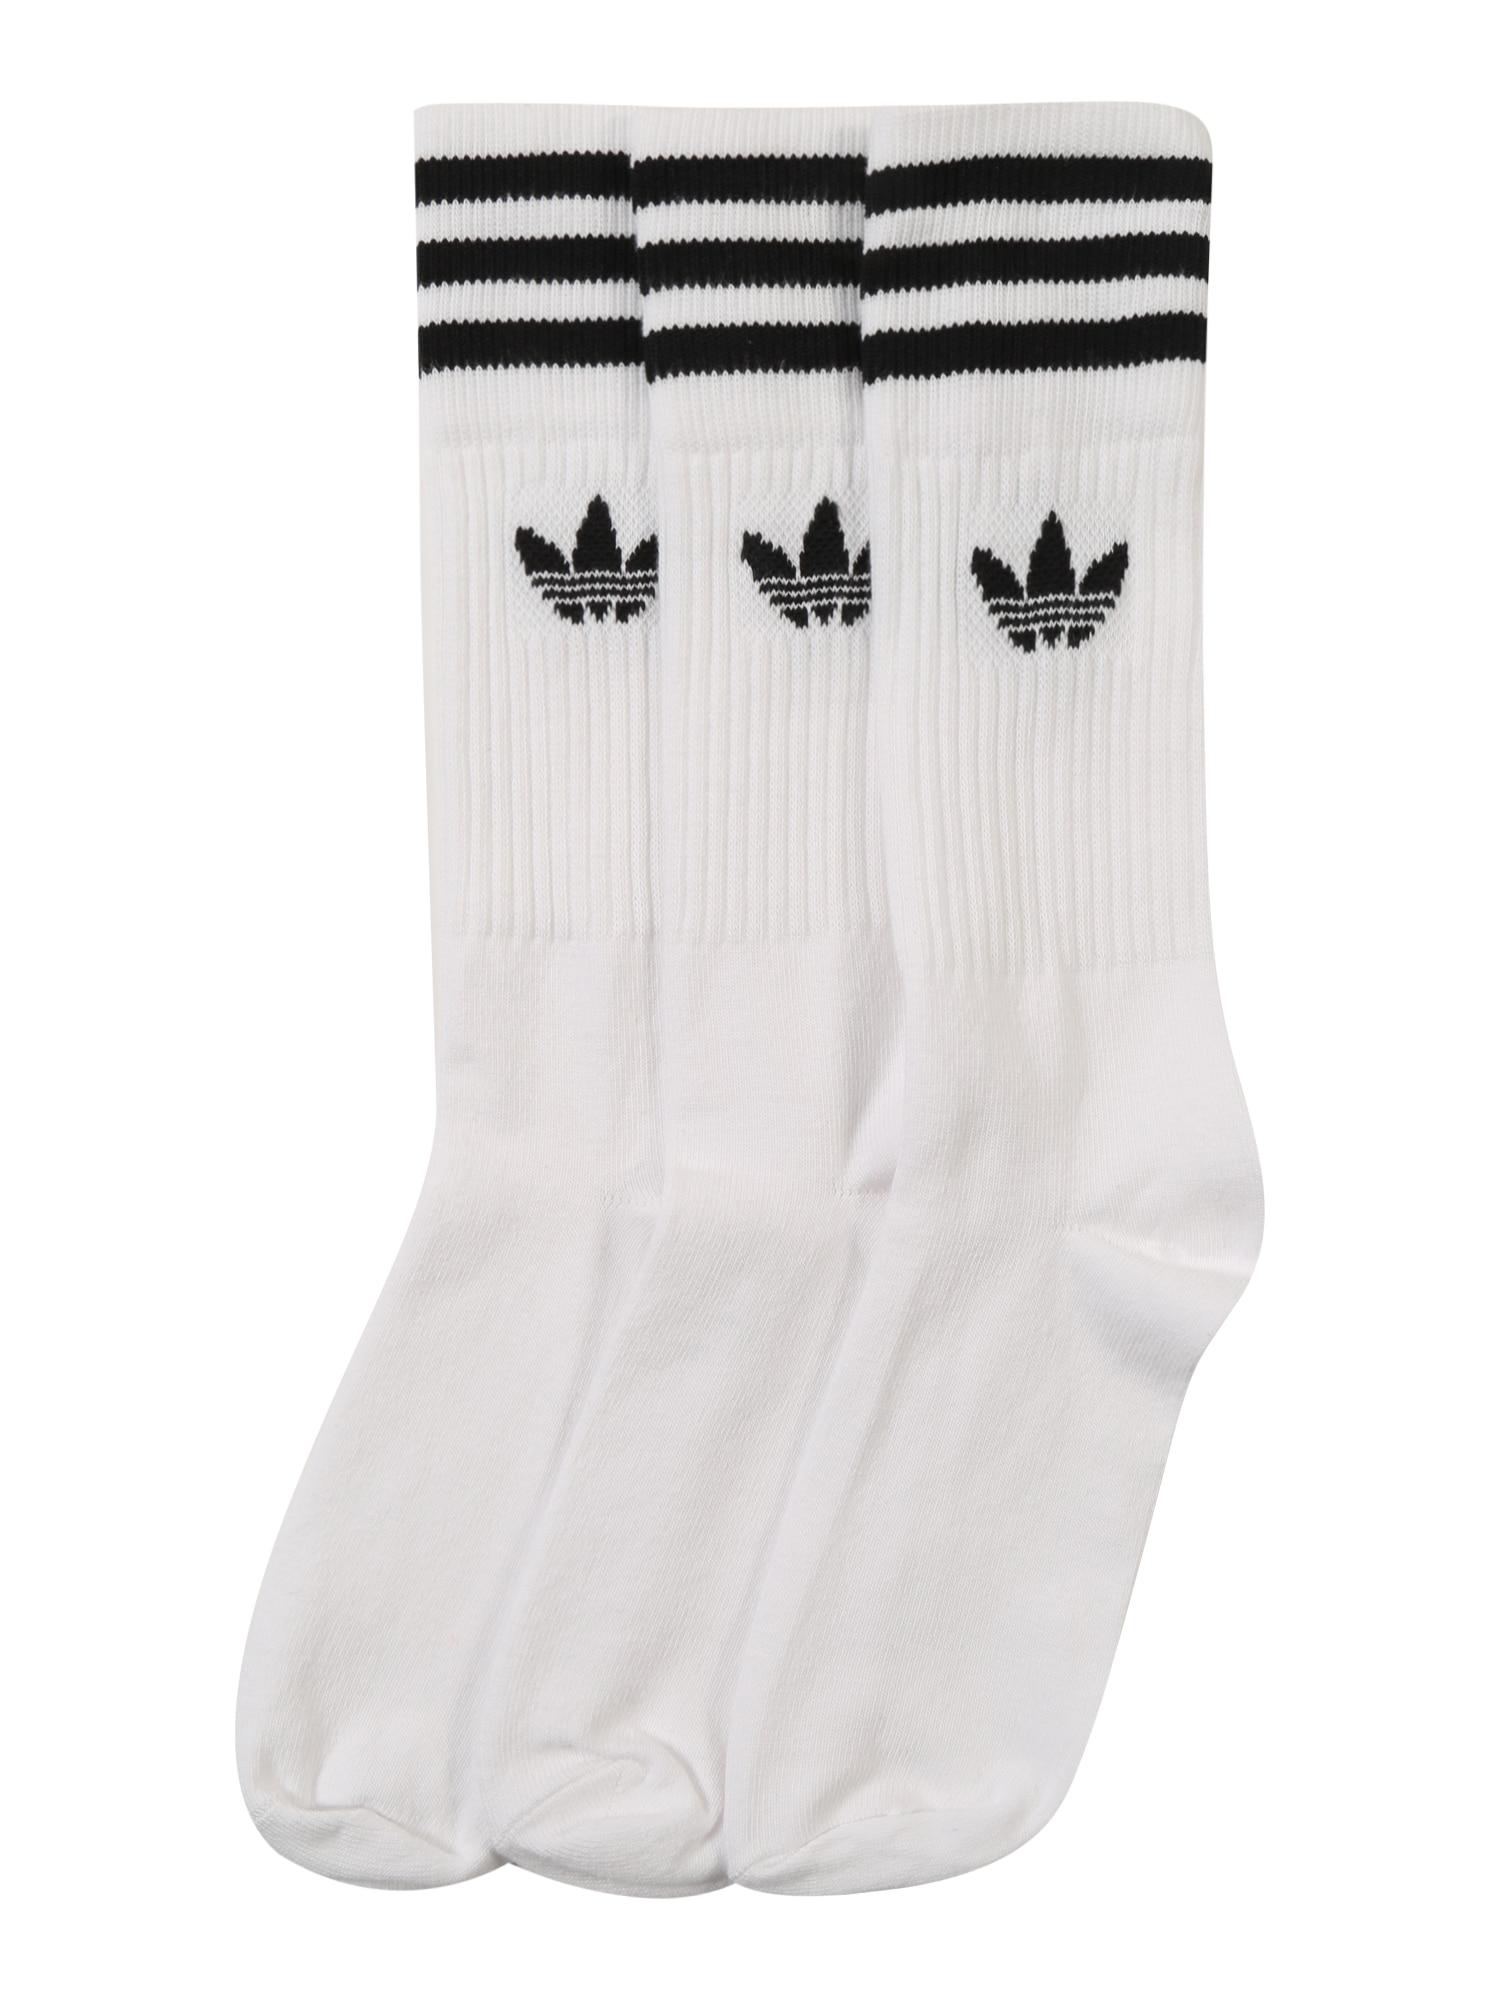 Ponožky SOLID CREW černá bílá ADIDAS ORIGINALS